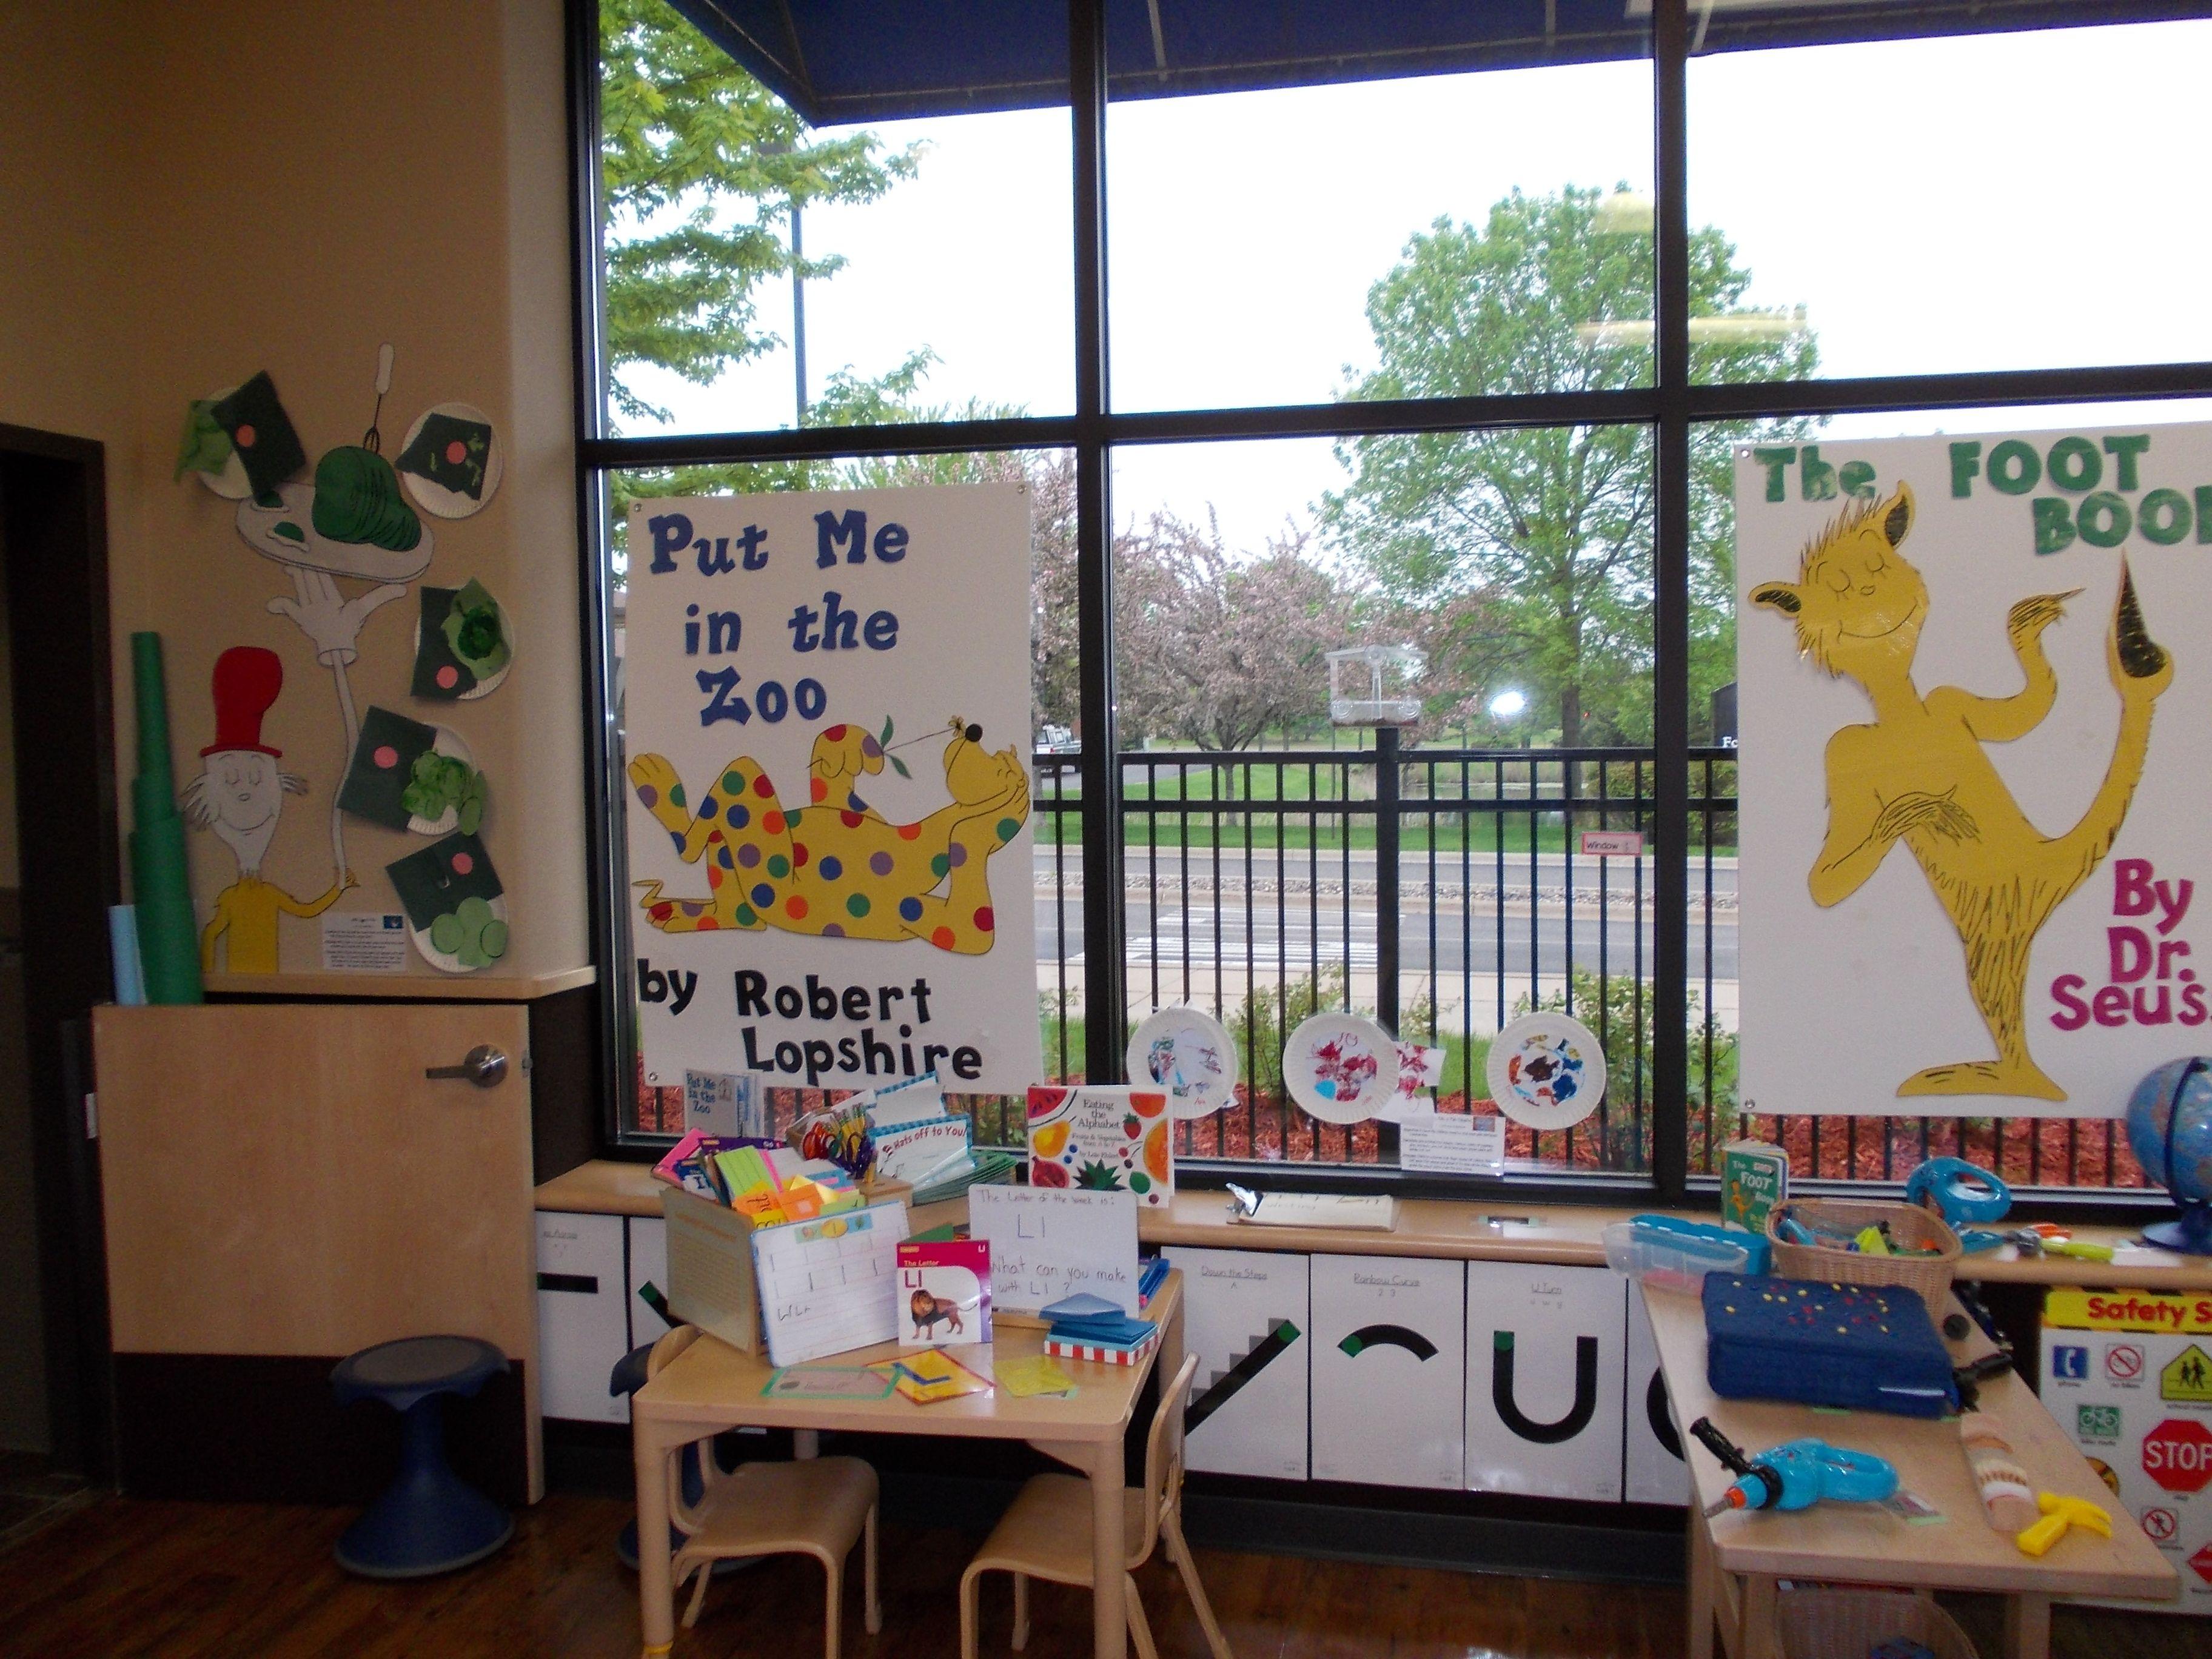 Preschool Dr Seuss Theme Room Enhancements The Foot Book